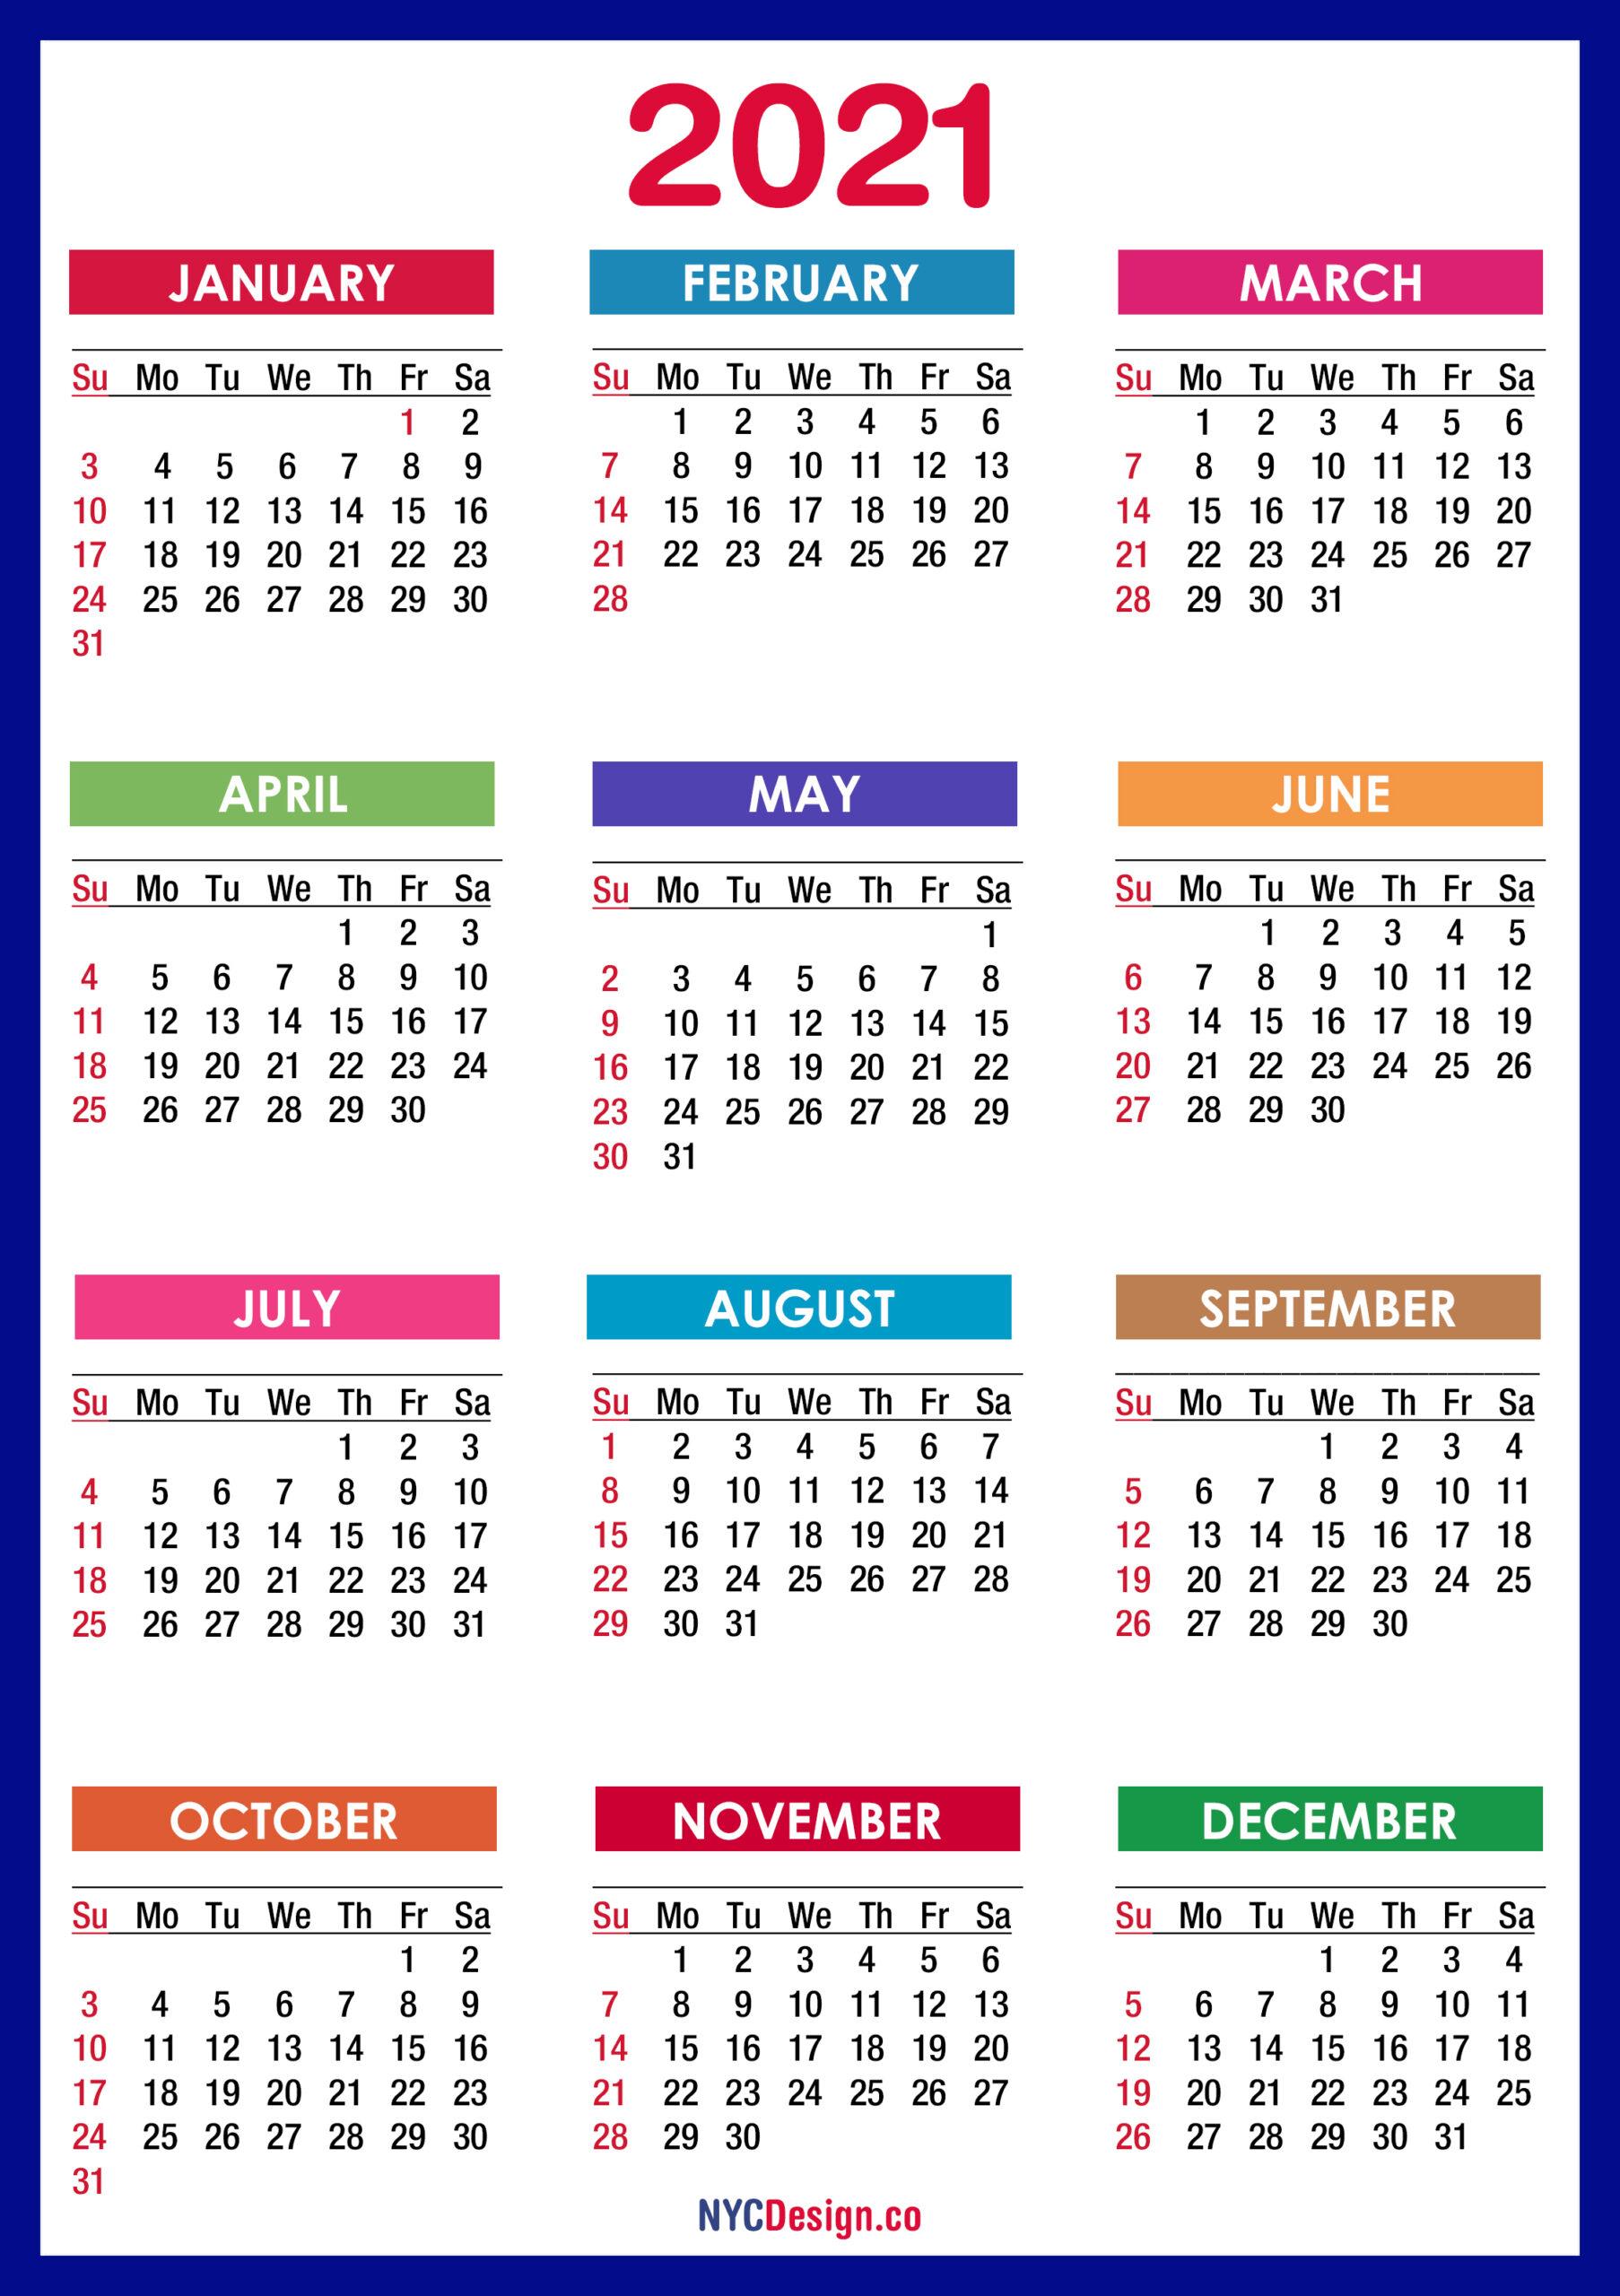 2021 Calendar Printable Free Pdf Colorful Blue Green